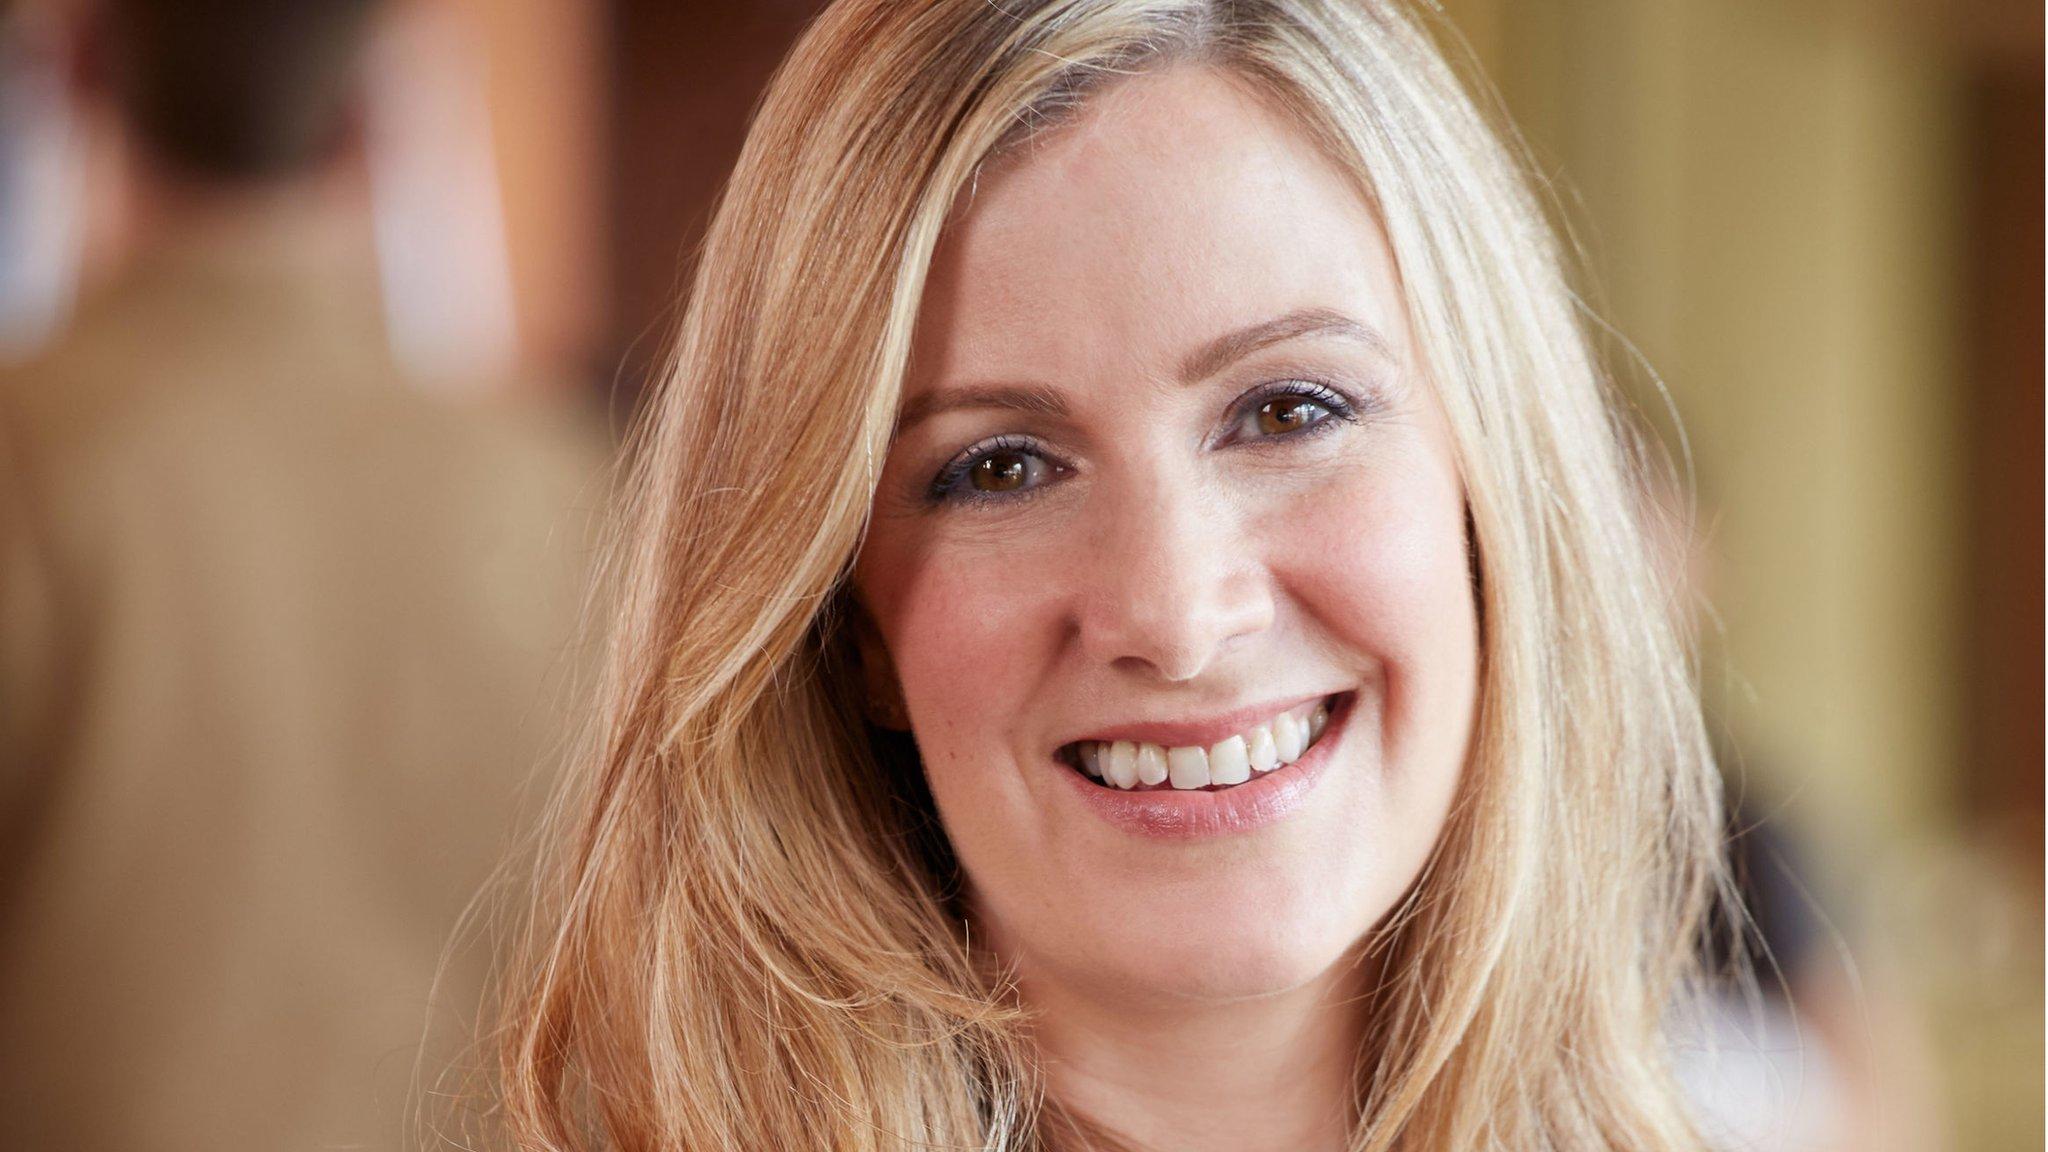 BBC presenter Rachael Bland dies aged 40